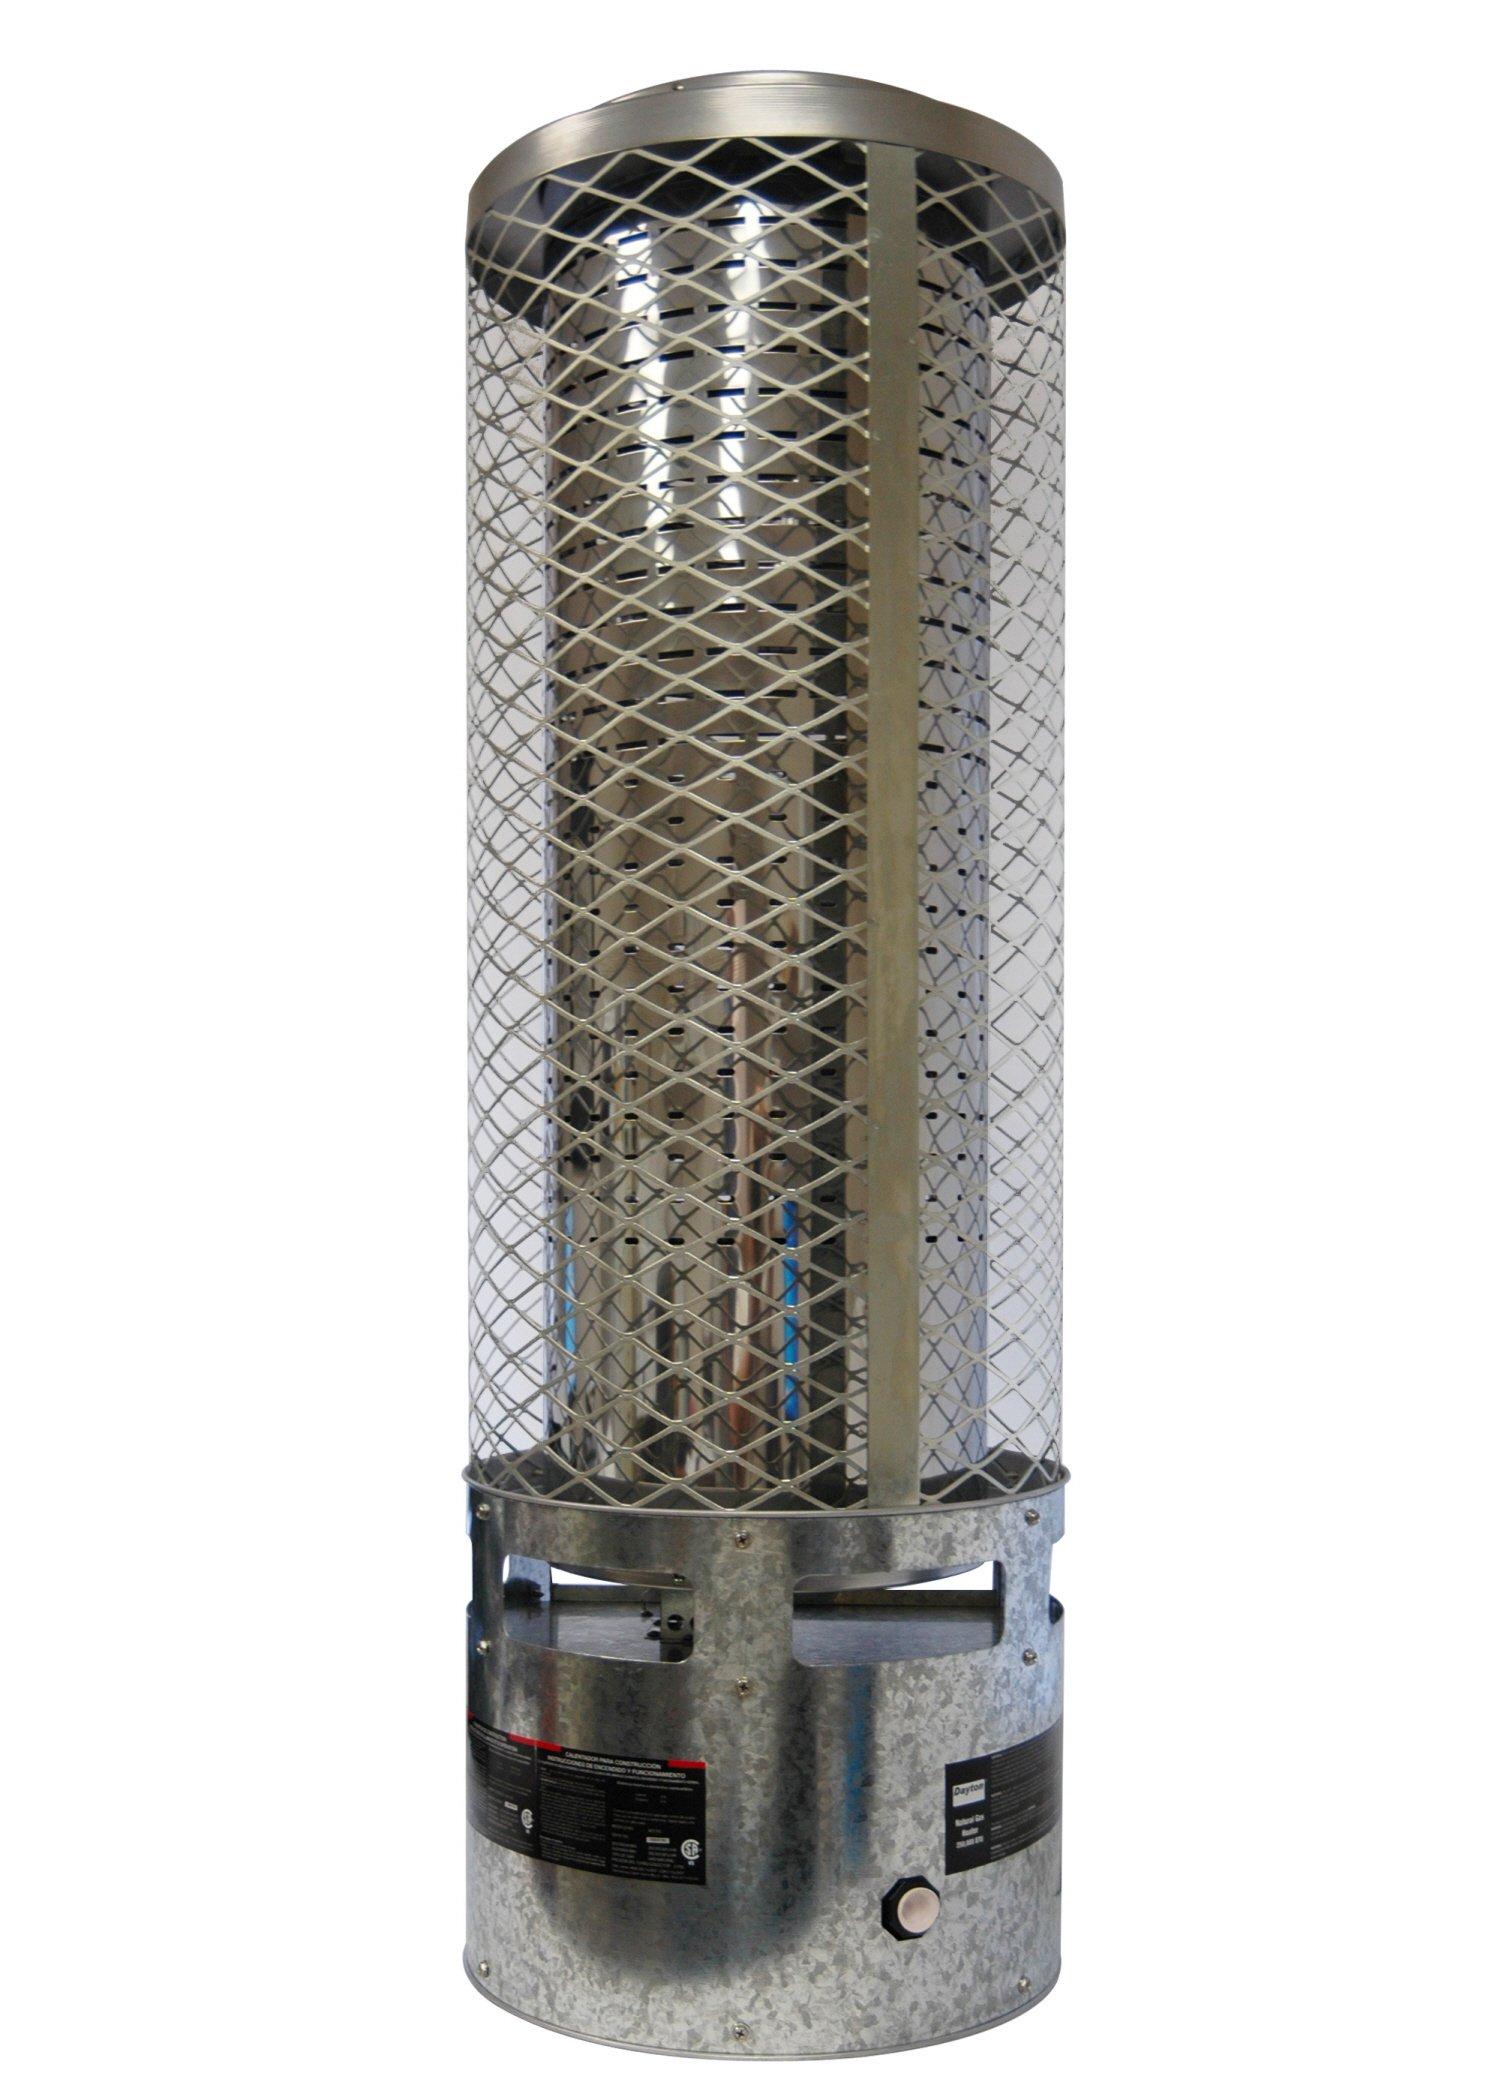 Dura Heat Radiant Heater, 250,000 BTUs by Dyna Glo